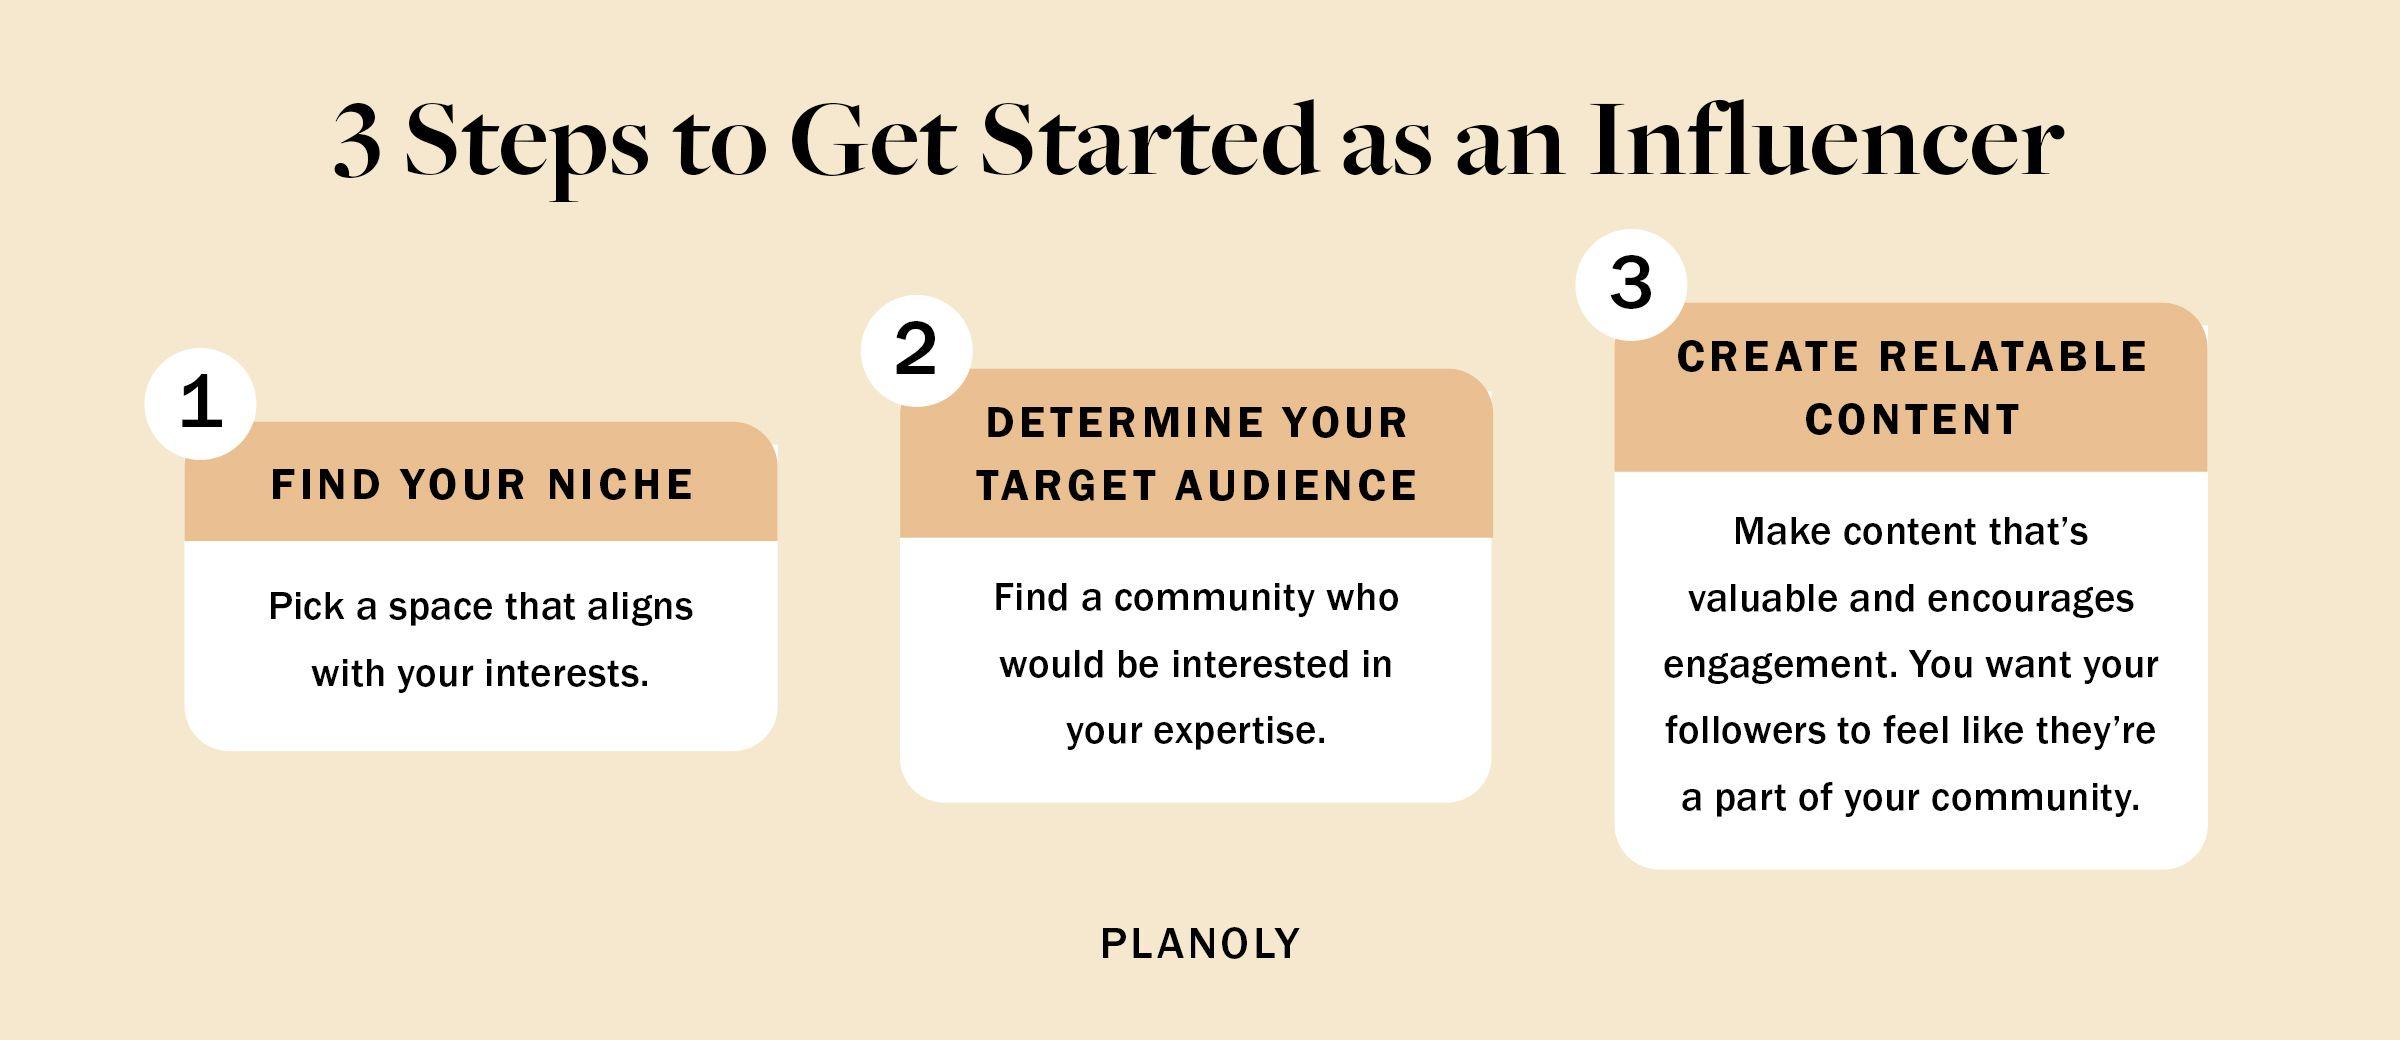 PLANOLY - Blog - How to Become an Instagram Influencer - Horizontal